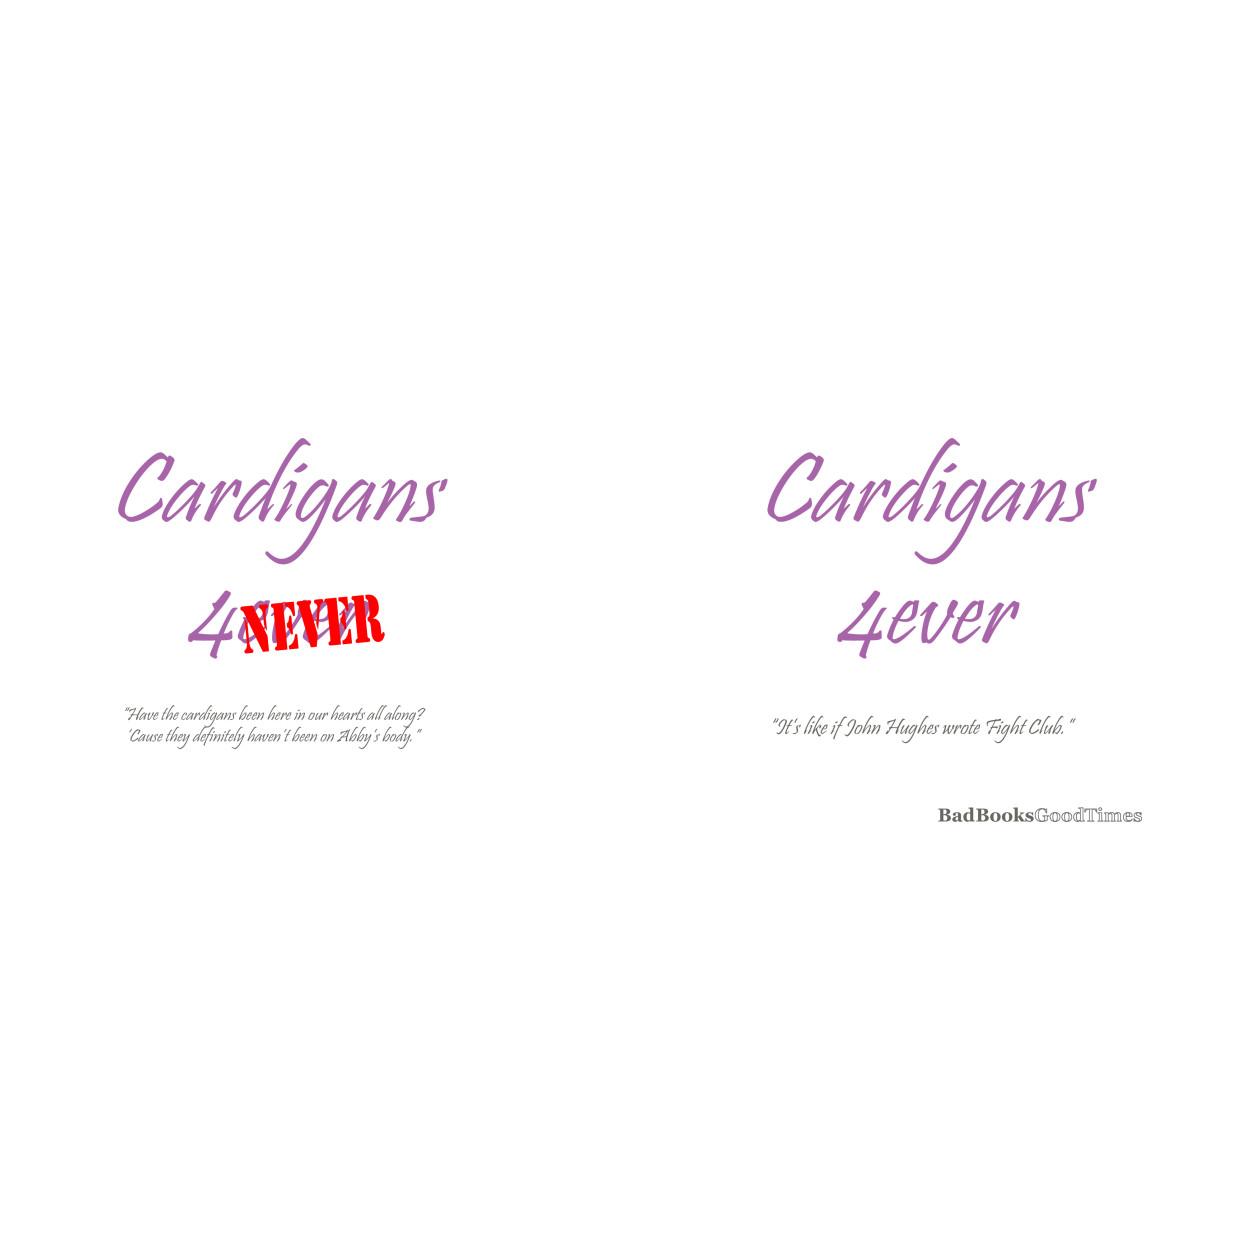 Cardigans 4ever/Cardigans 4NEVER